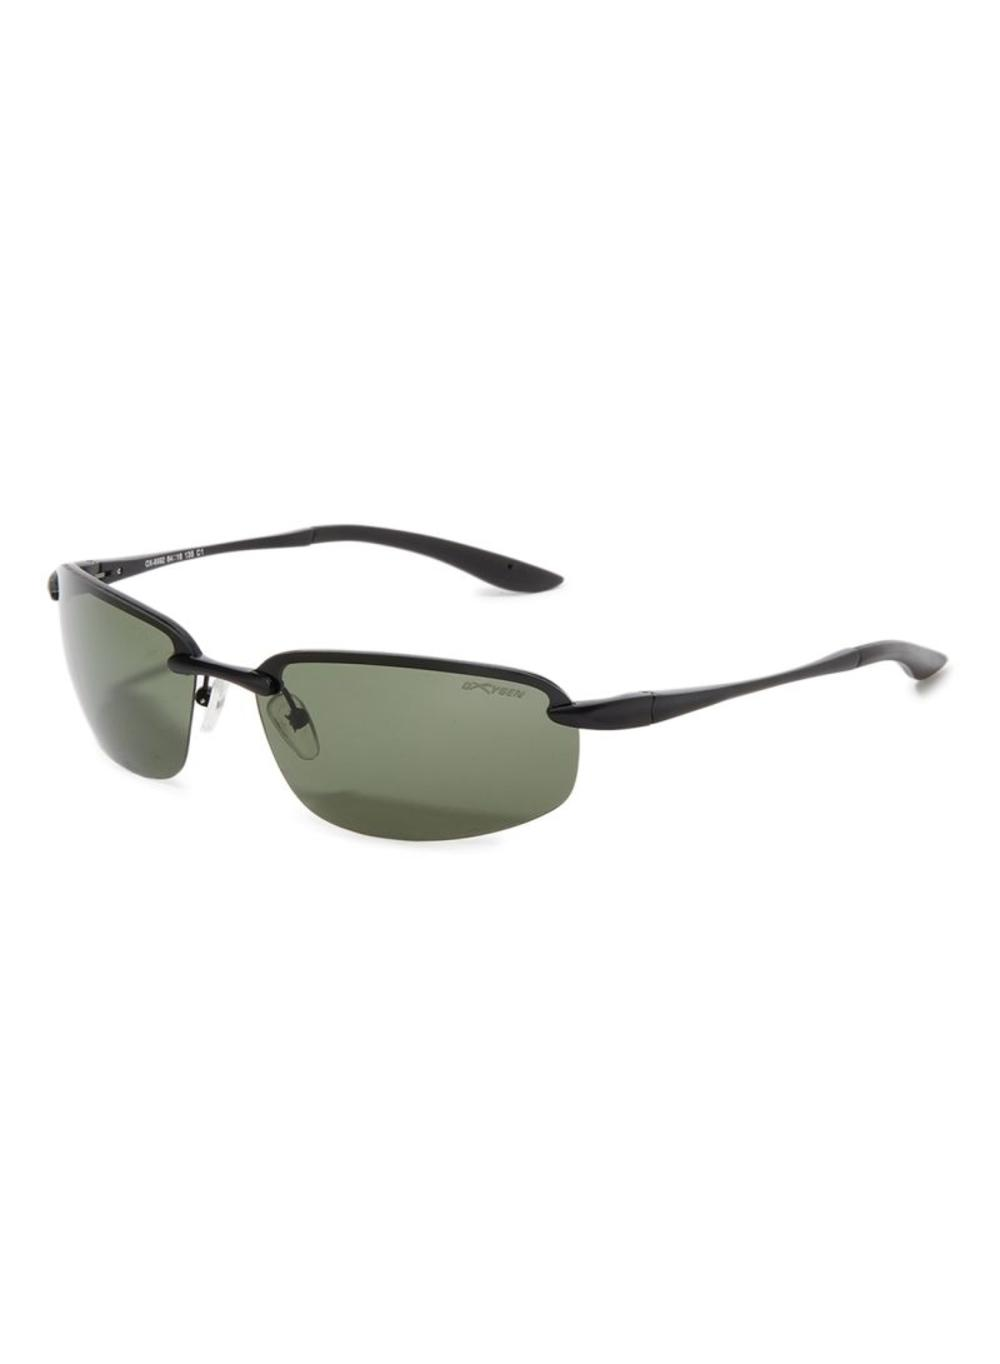 OXYGEN Mens Sports UV Protection Sunglasses OX8992-C1